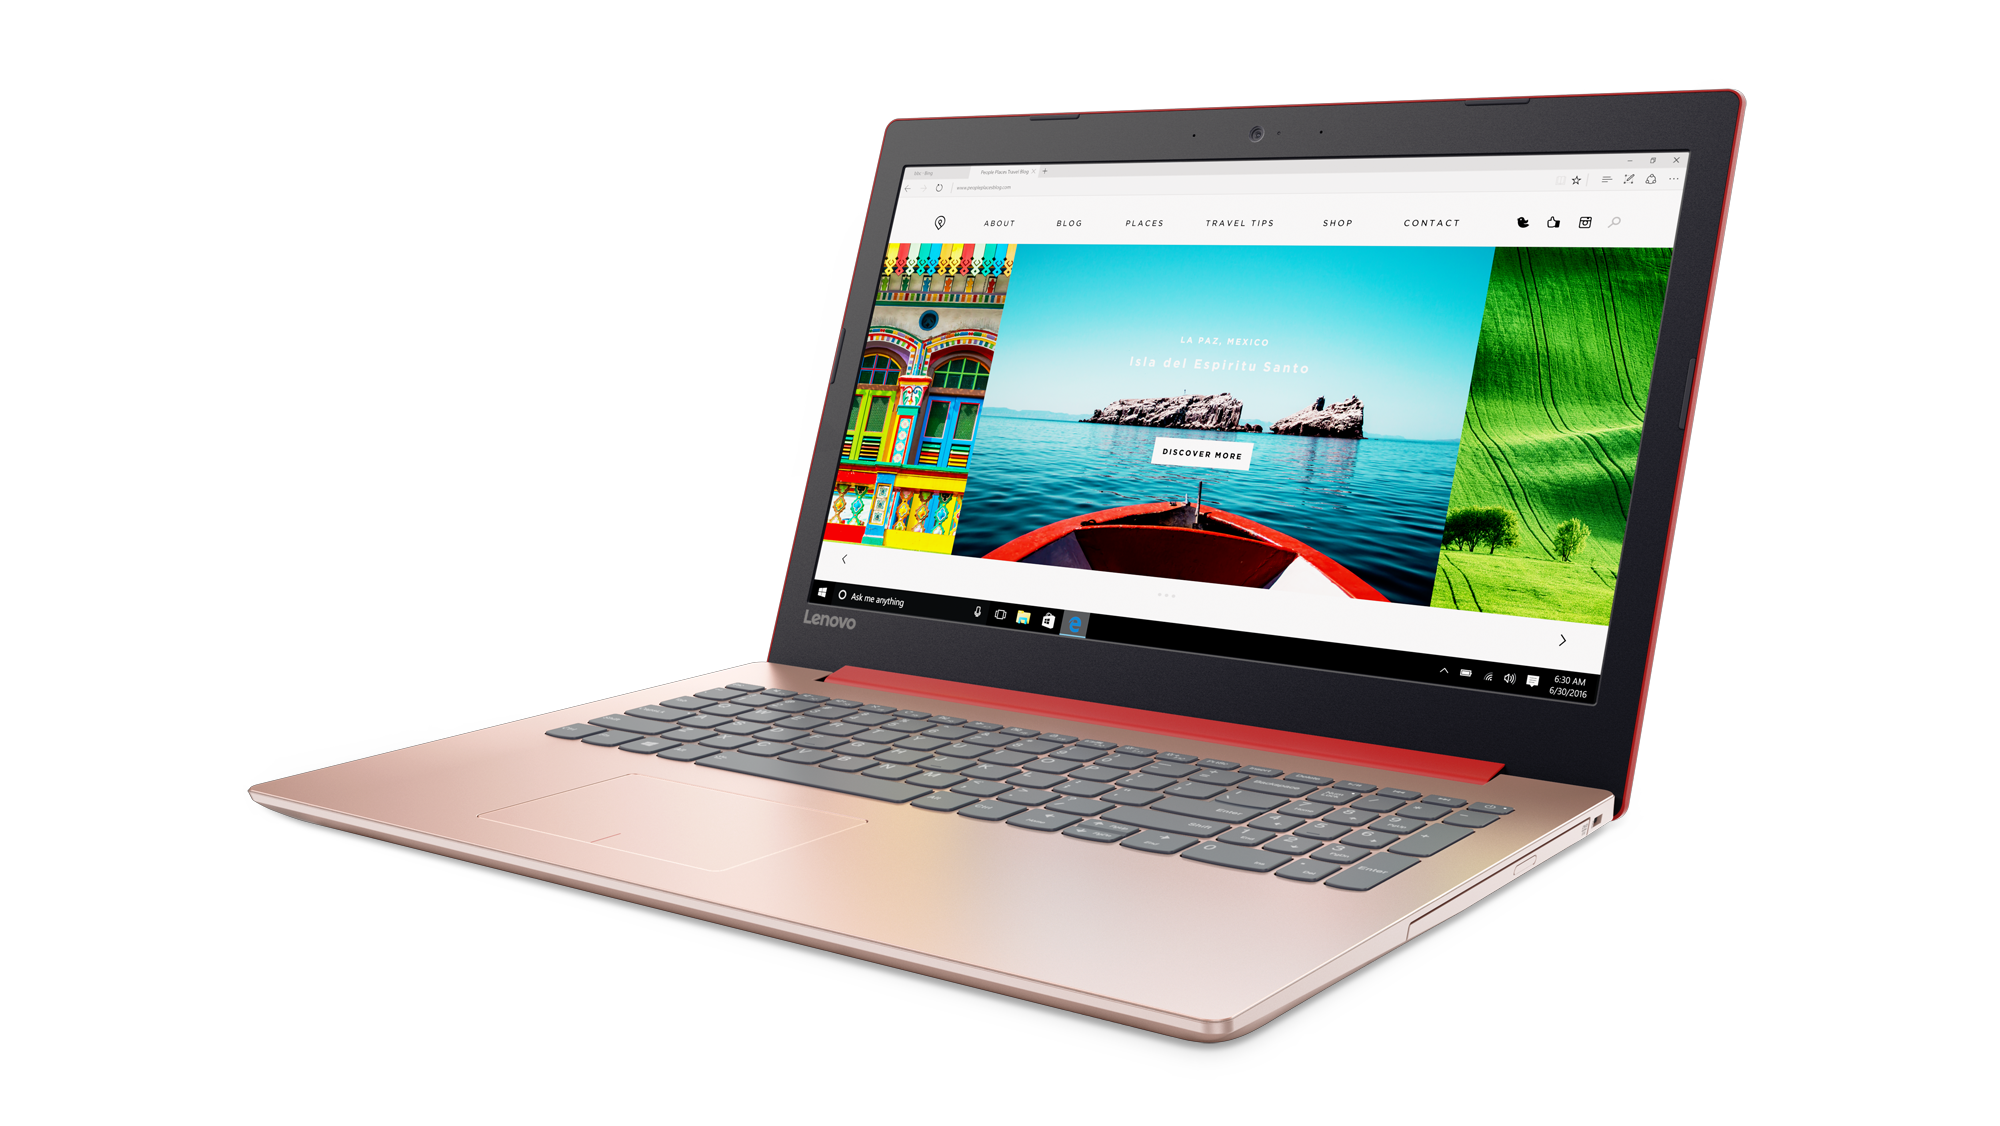 "Lenovo IdeaPad 320-15IKBRN i5-8250U 3,40GHz/8GB/SSD 256GB/15,6"" FHD/AG/GeForce 2GB/WIN10 červená 81BG000JCK"